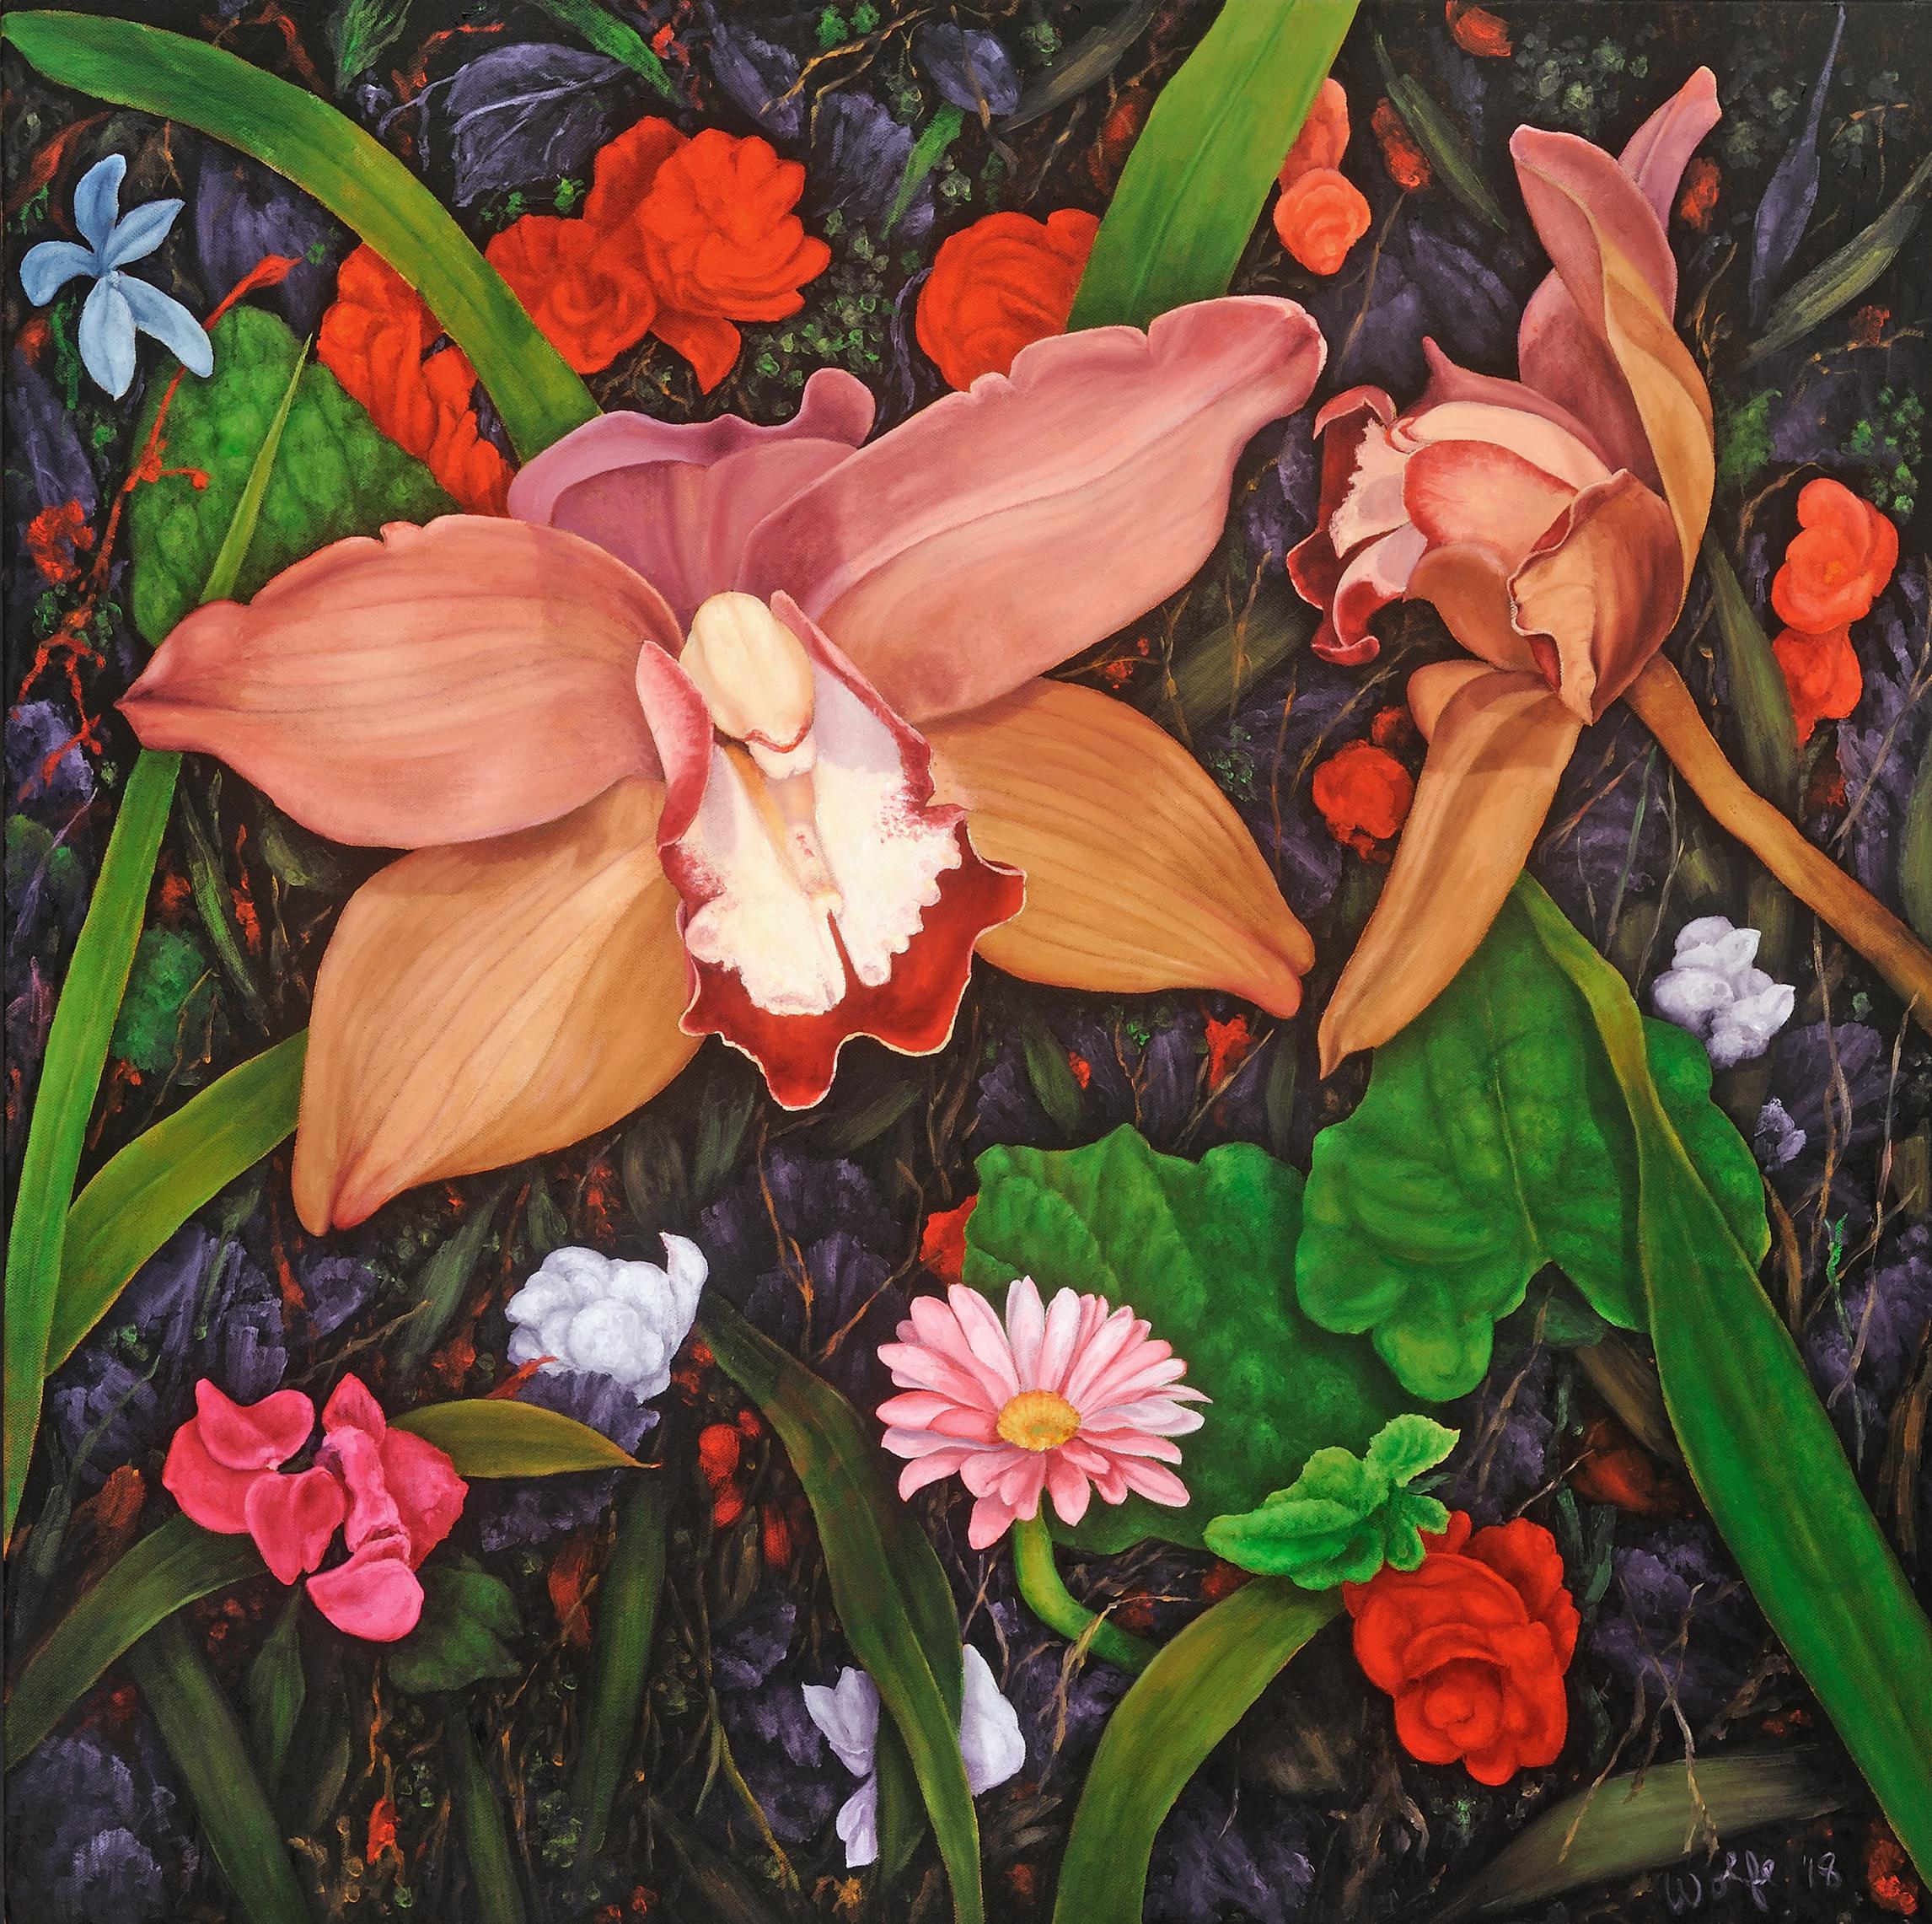 "Dreams In A Garden, 2018, David Wolfe. Oil on canvas. 30"" x 30""."